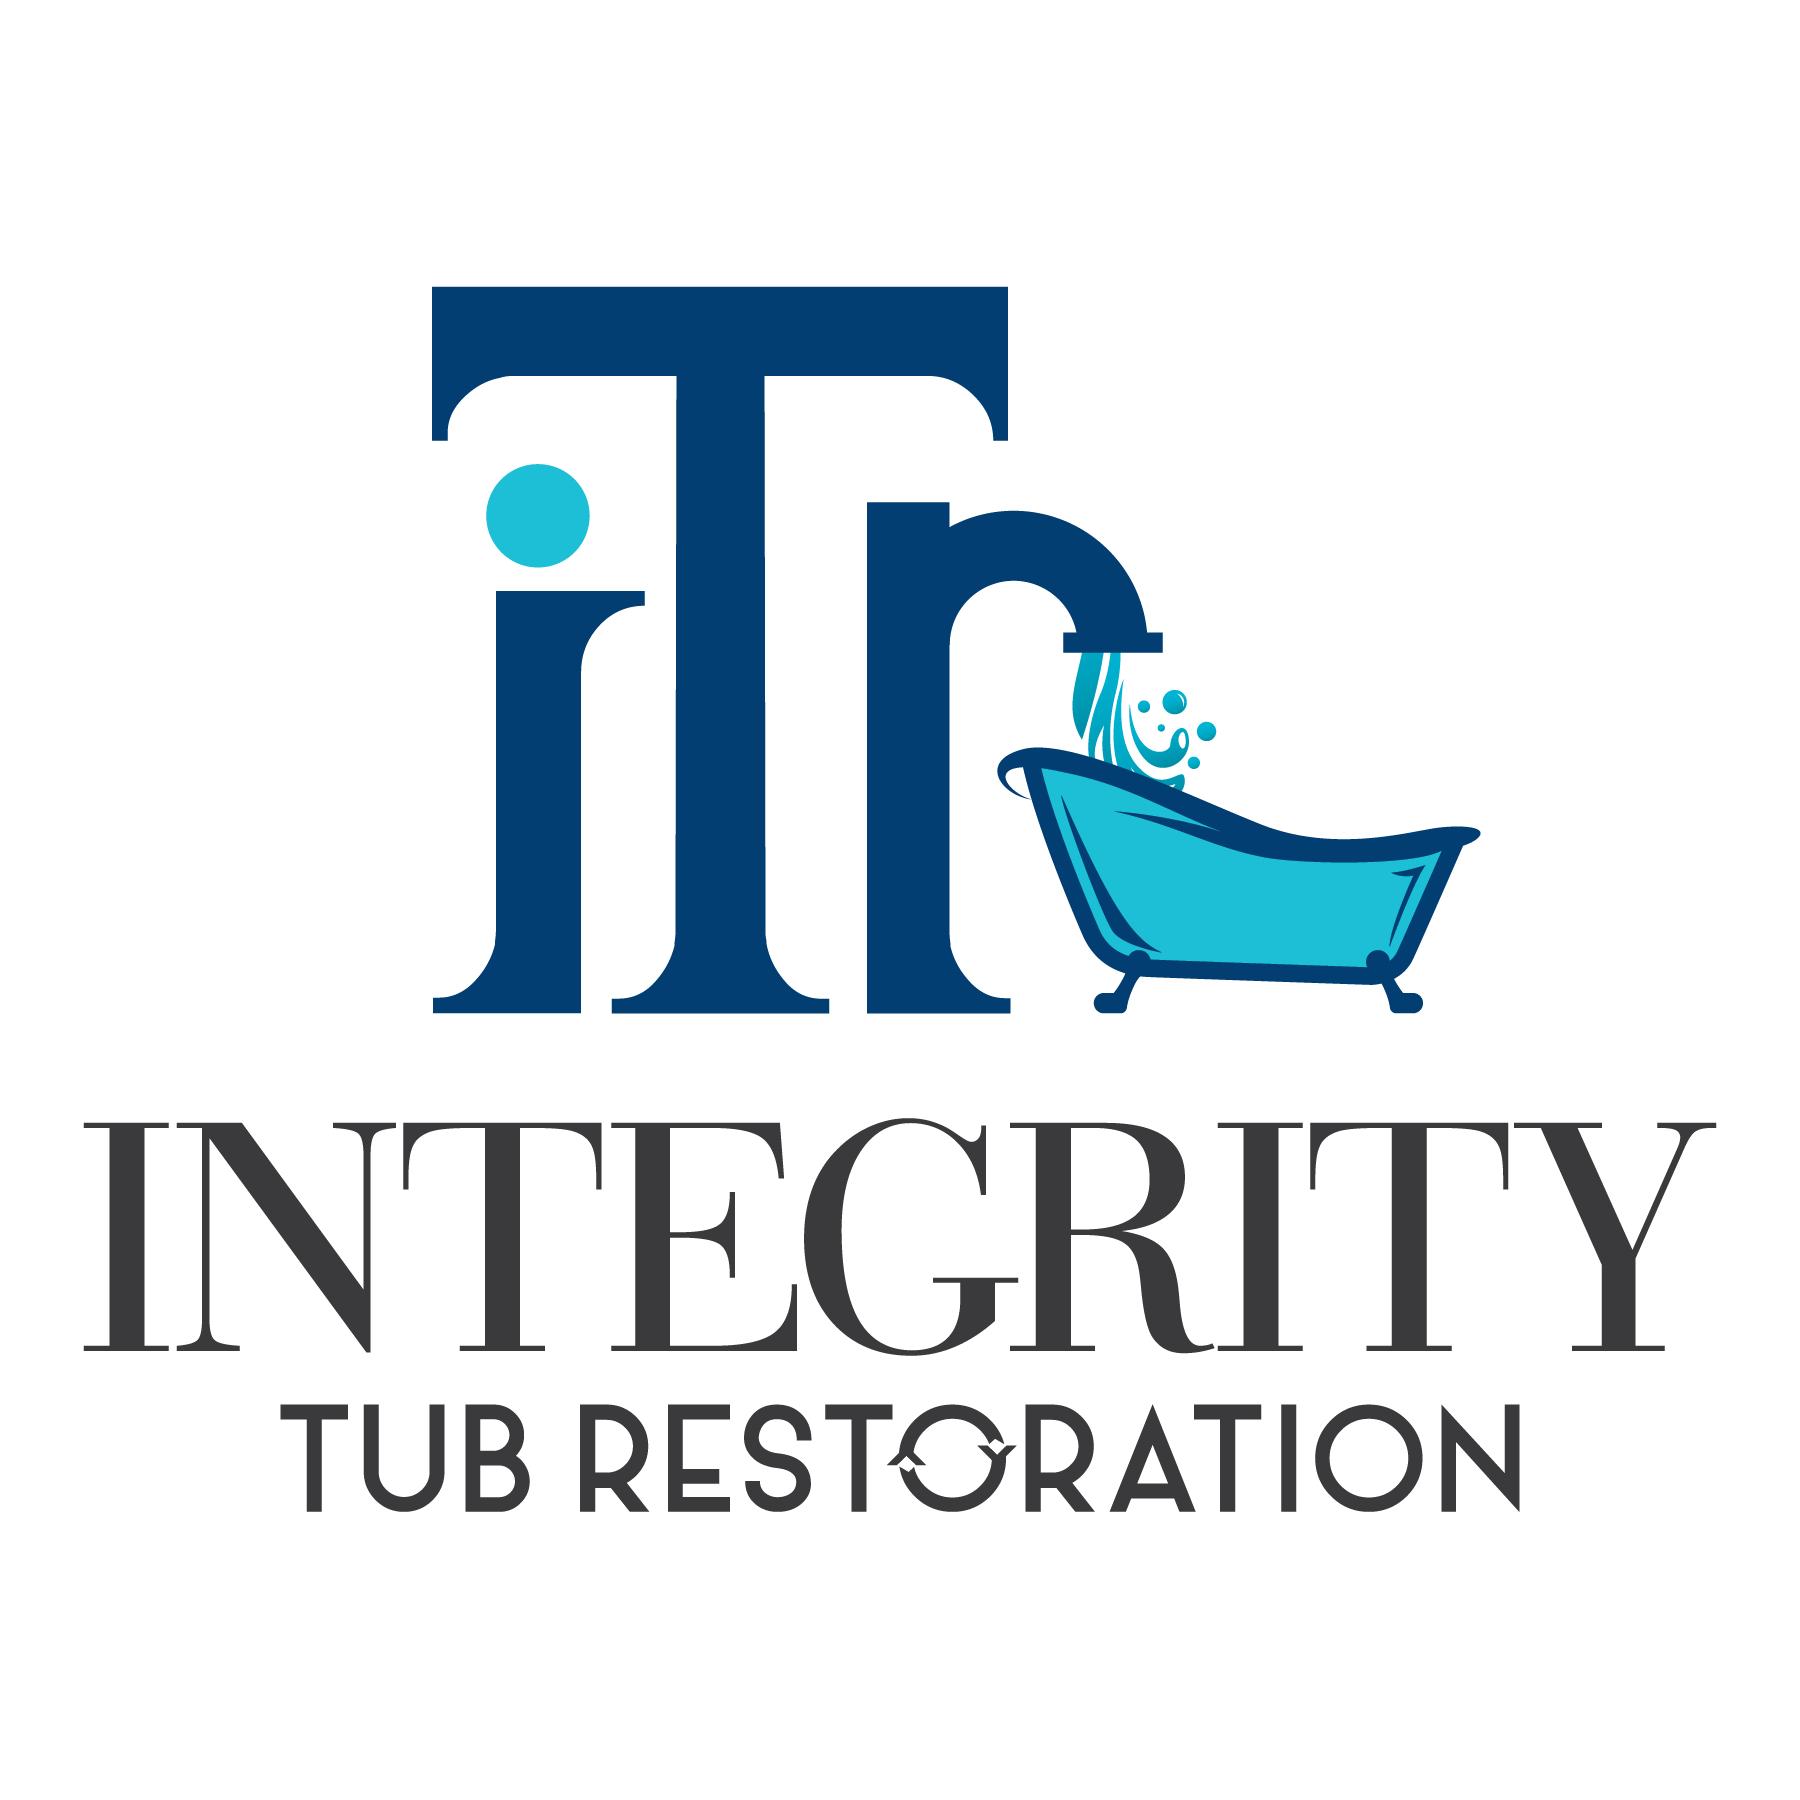 Integrity Tub Restoration